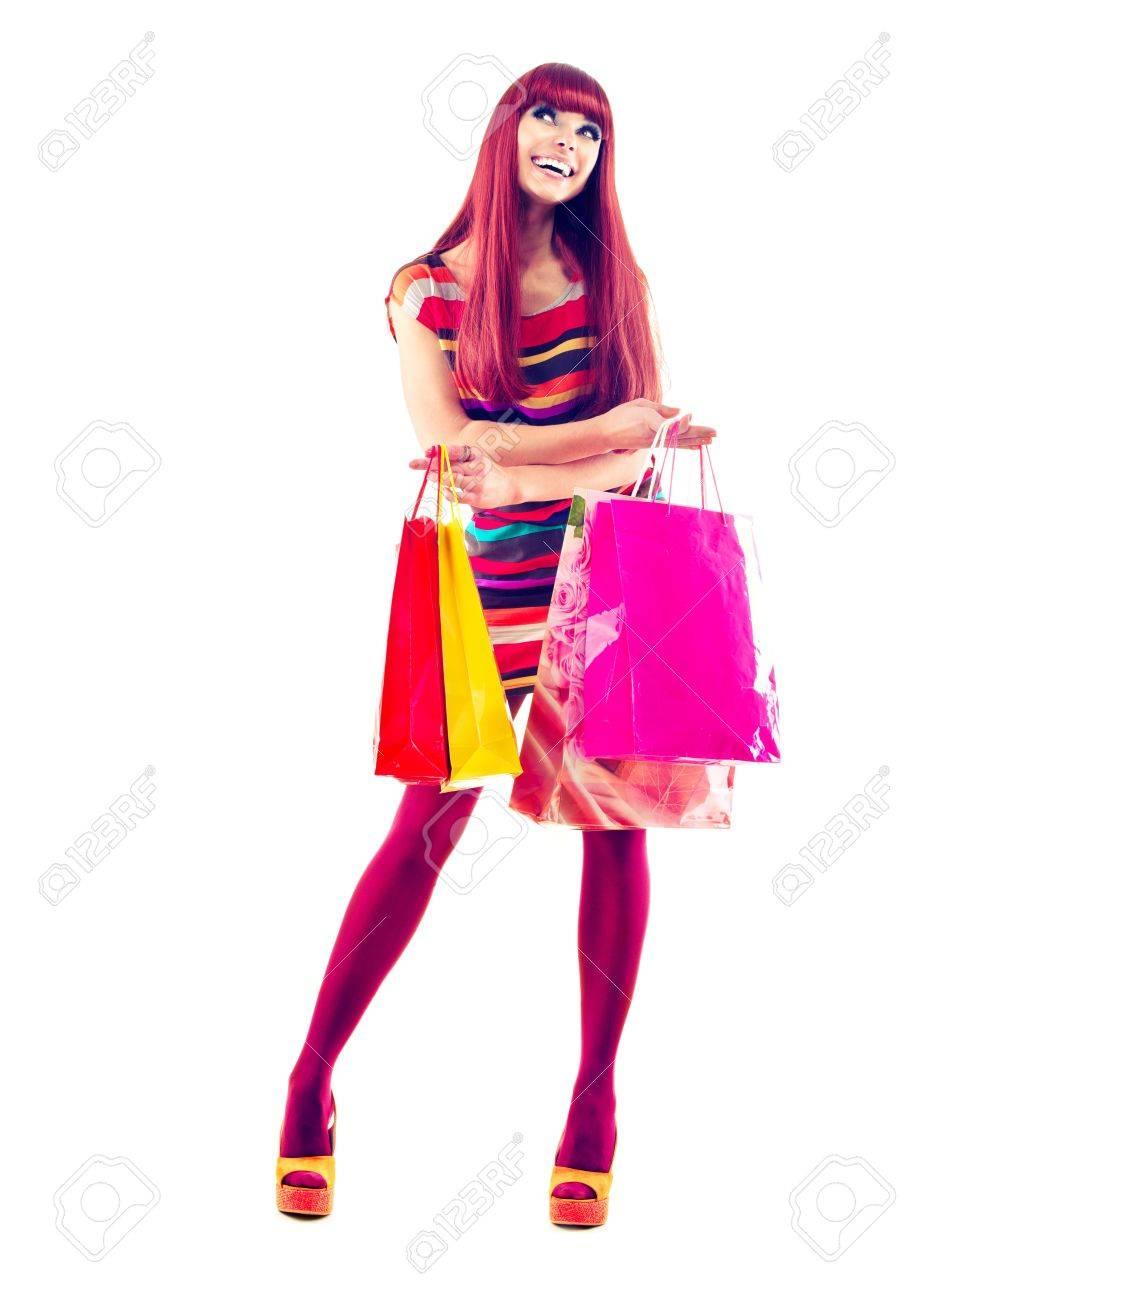 Fashion Shopping Girl full length Portrait Stock Photo - 19135758